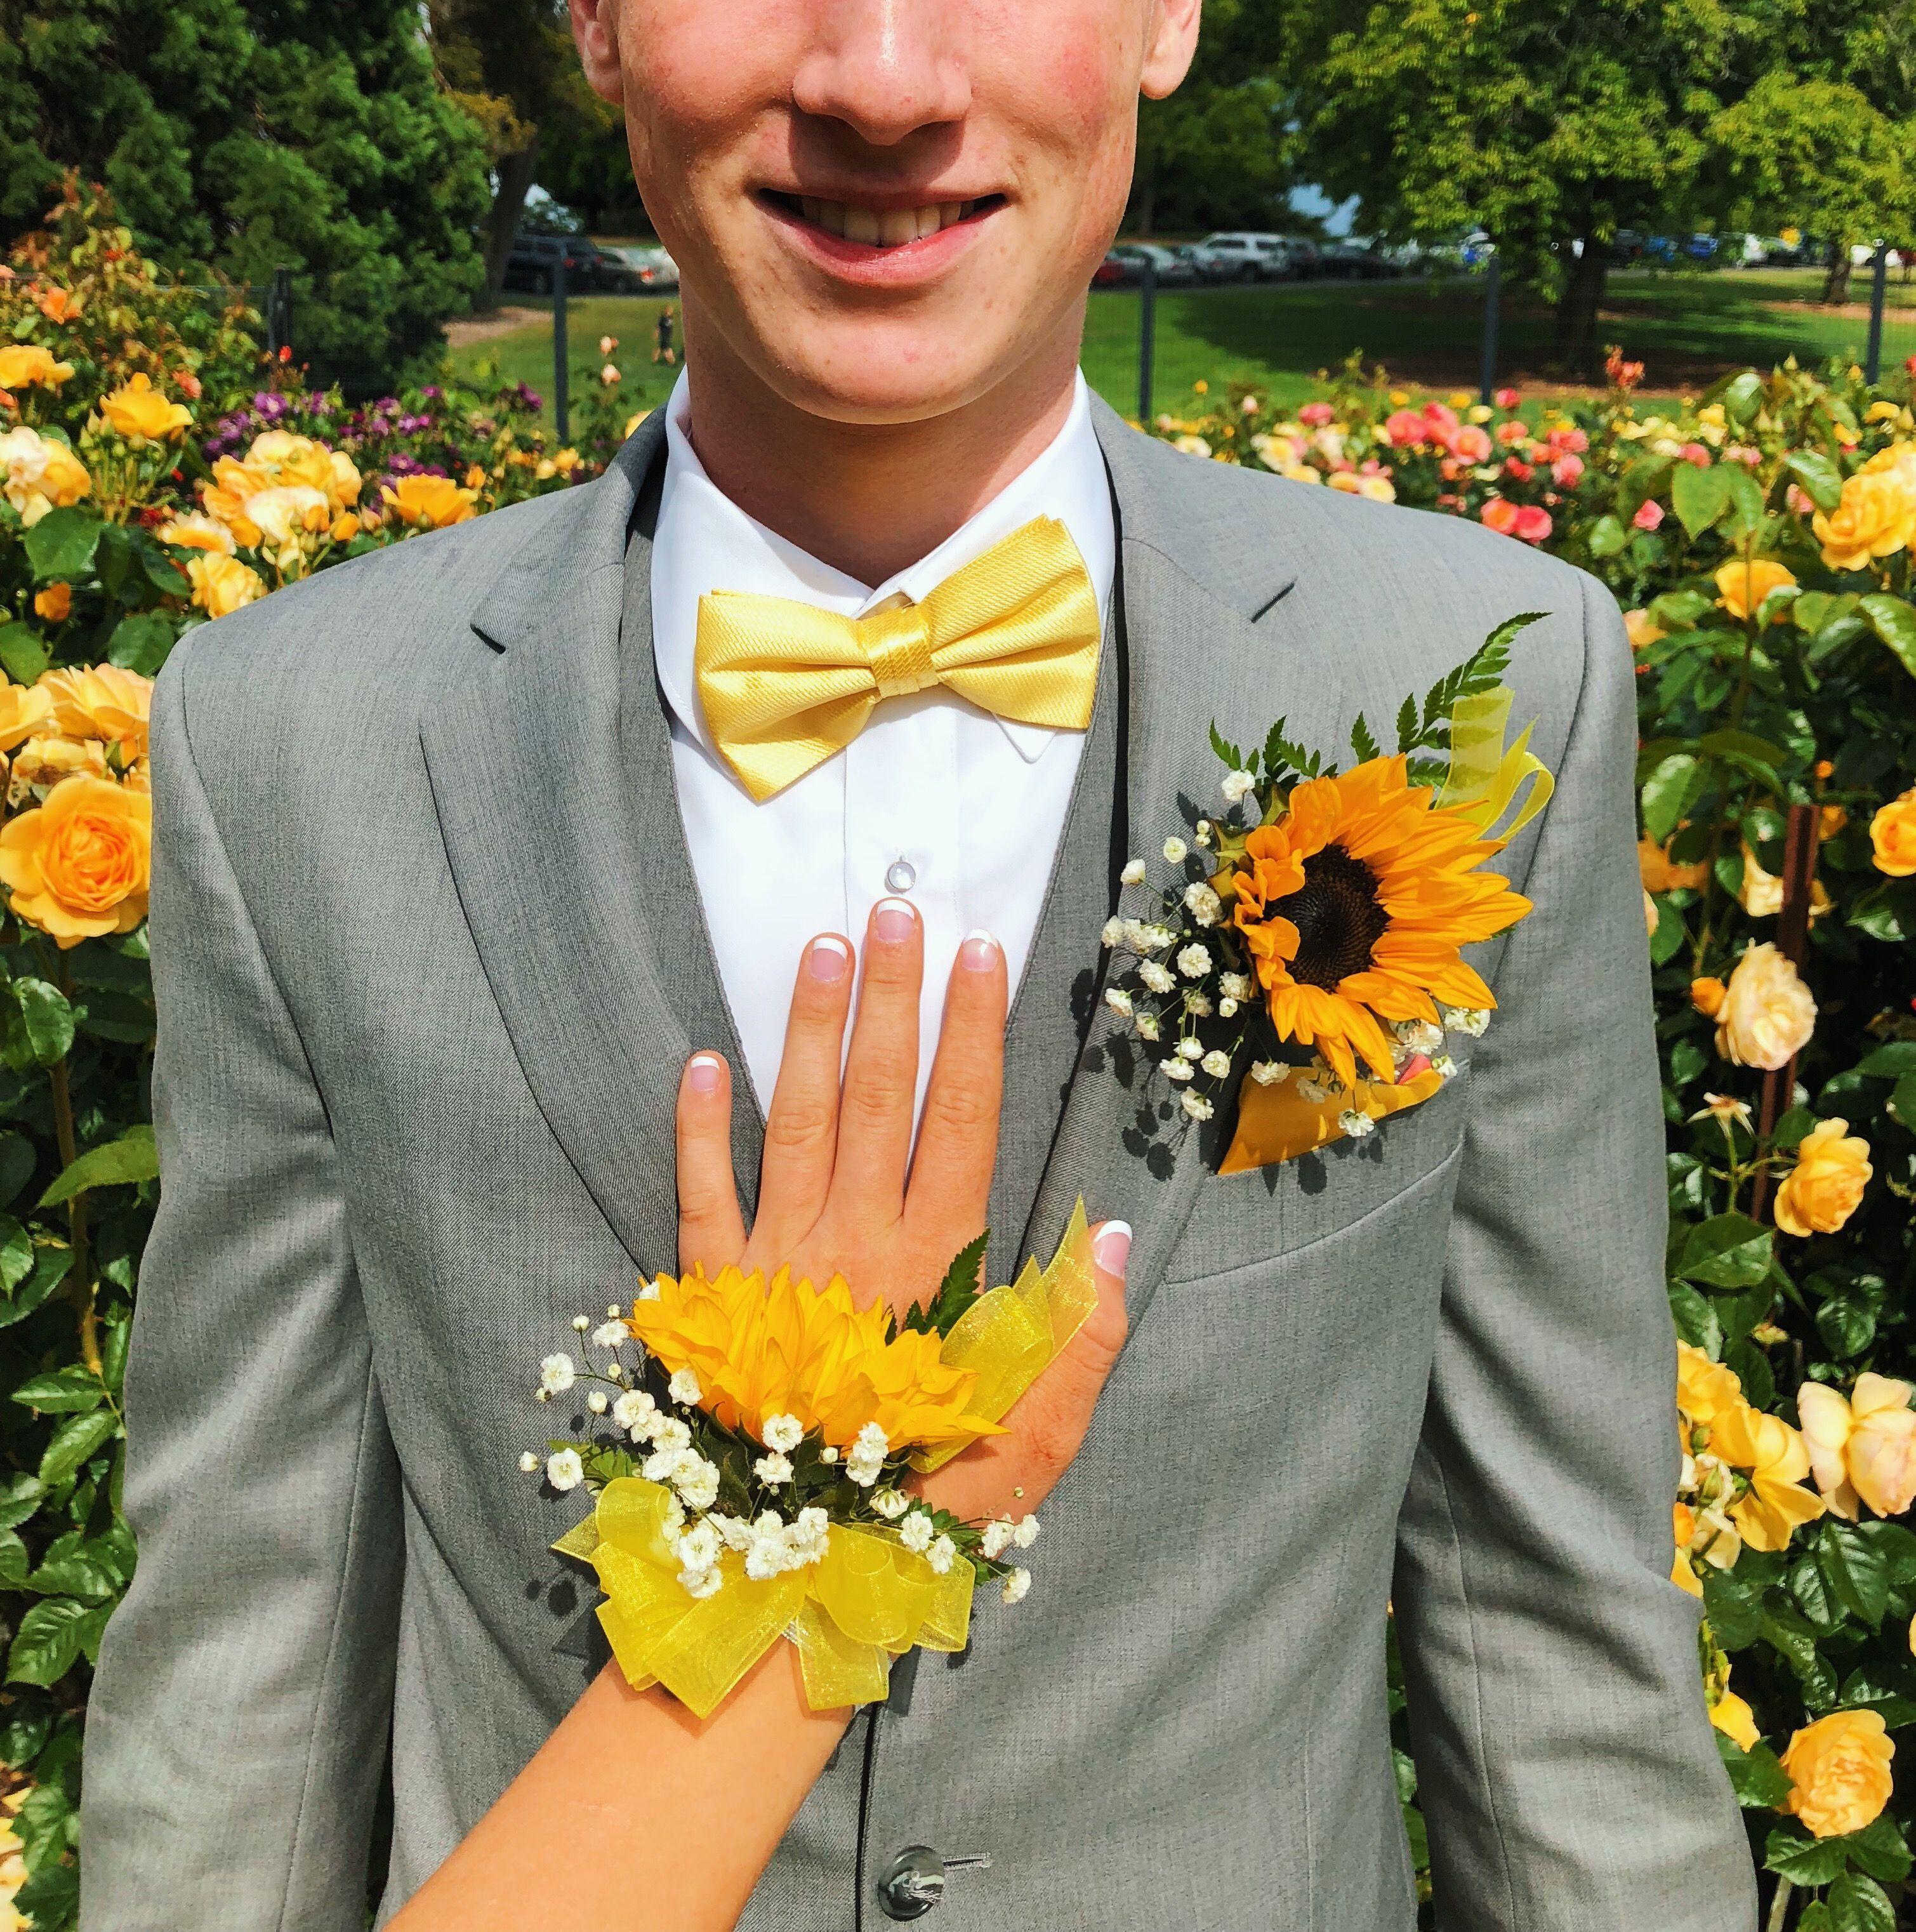 Sunflower Prom Prompicturescouples Prompictureposes Prom Couples Prom Poses Prom Dresses Yellow [ 3044 x 3019 Pixel ]